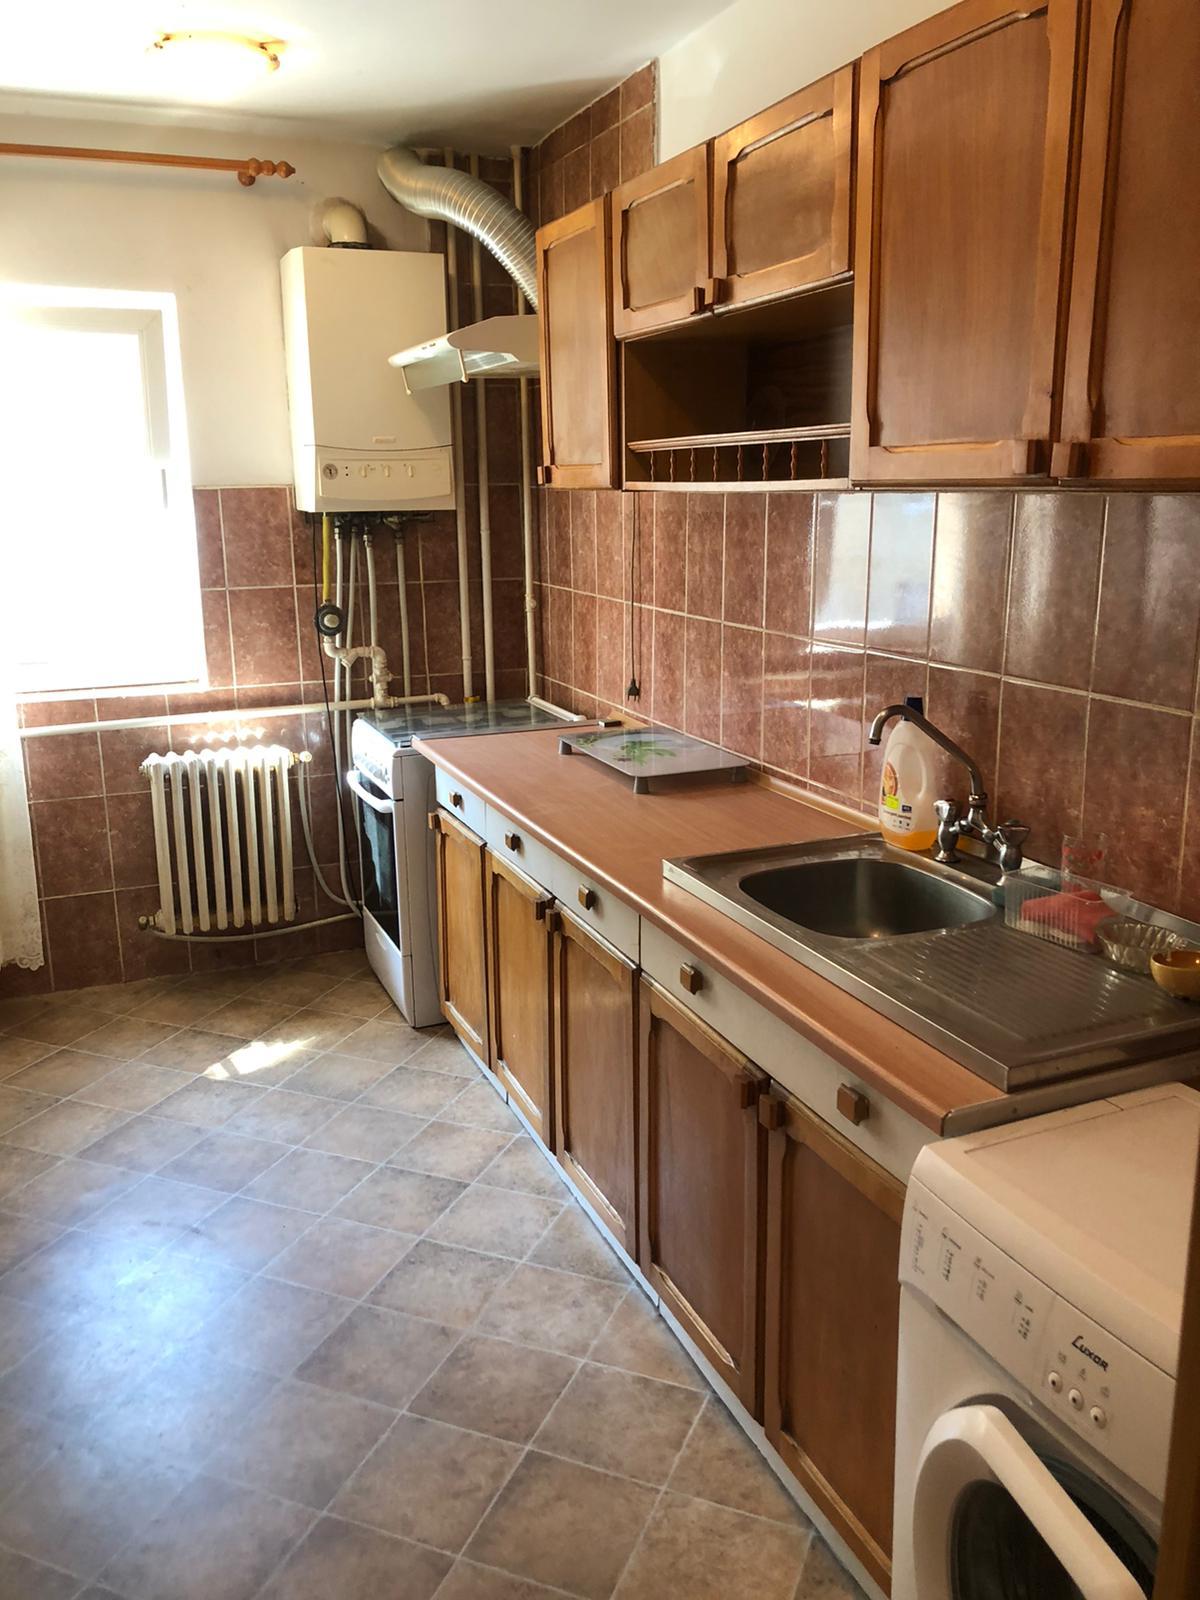 176707-Vanzare apartament 2 camere, Marasti, Cluj-Napoca